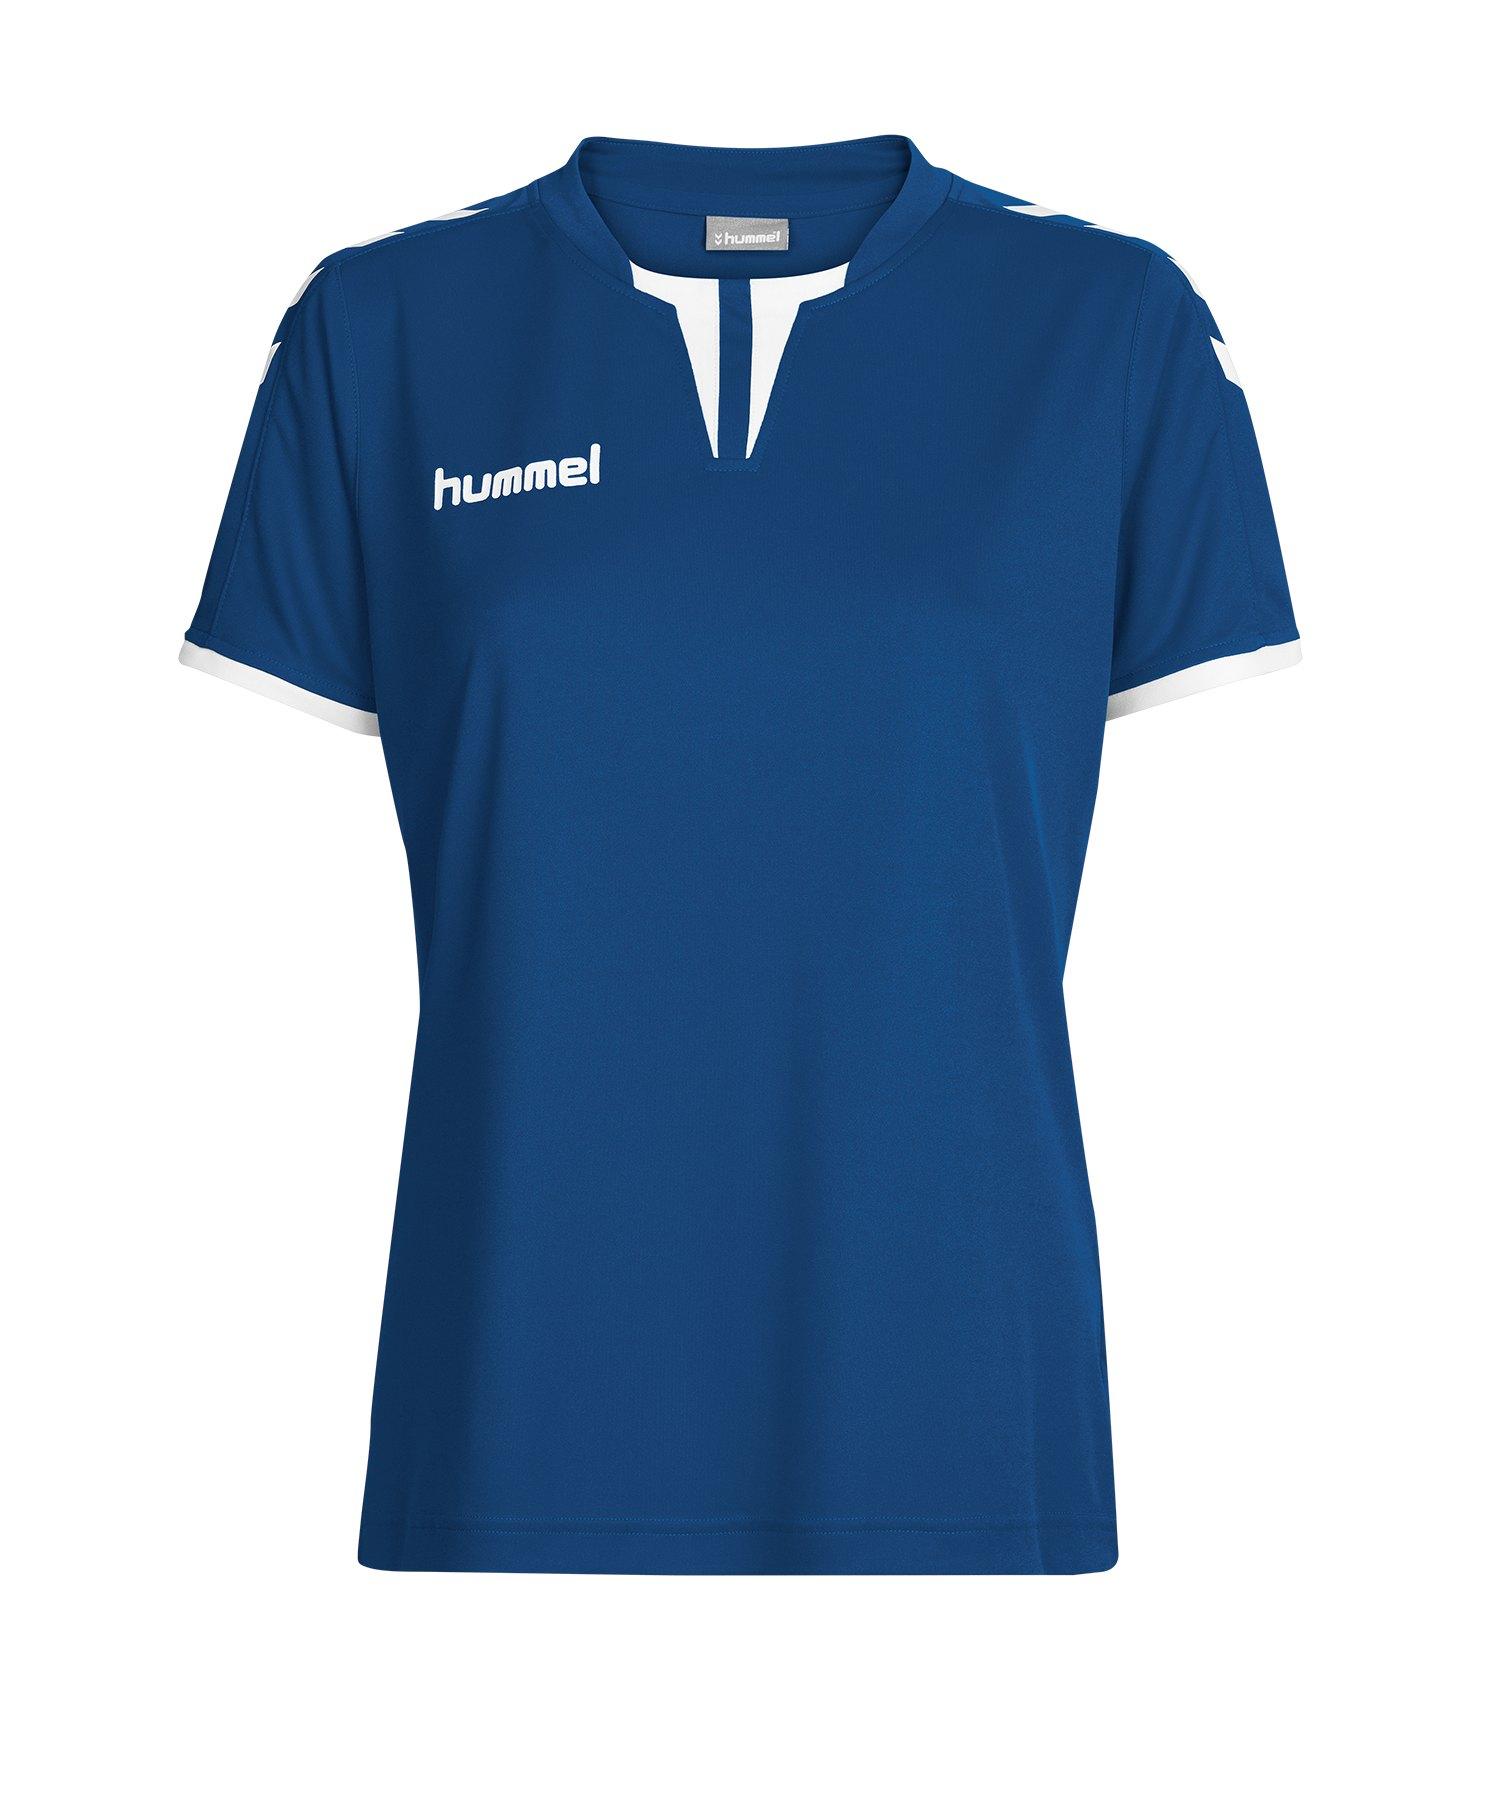 Hummel Core Trikot kurzarm Damen Blau F7044 - blau